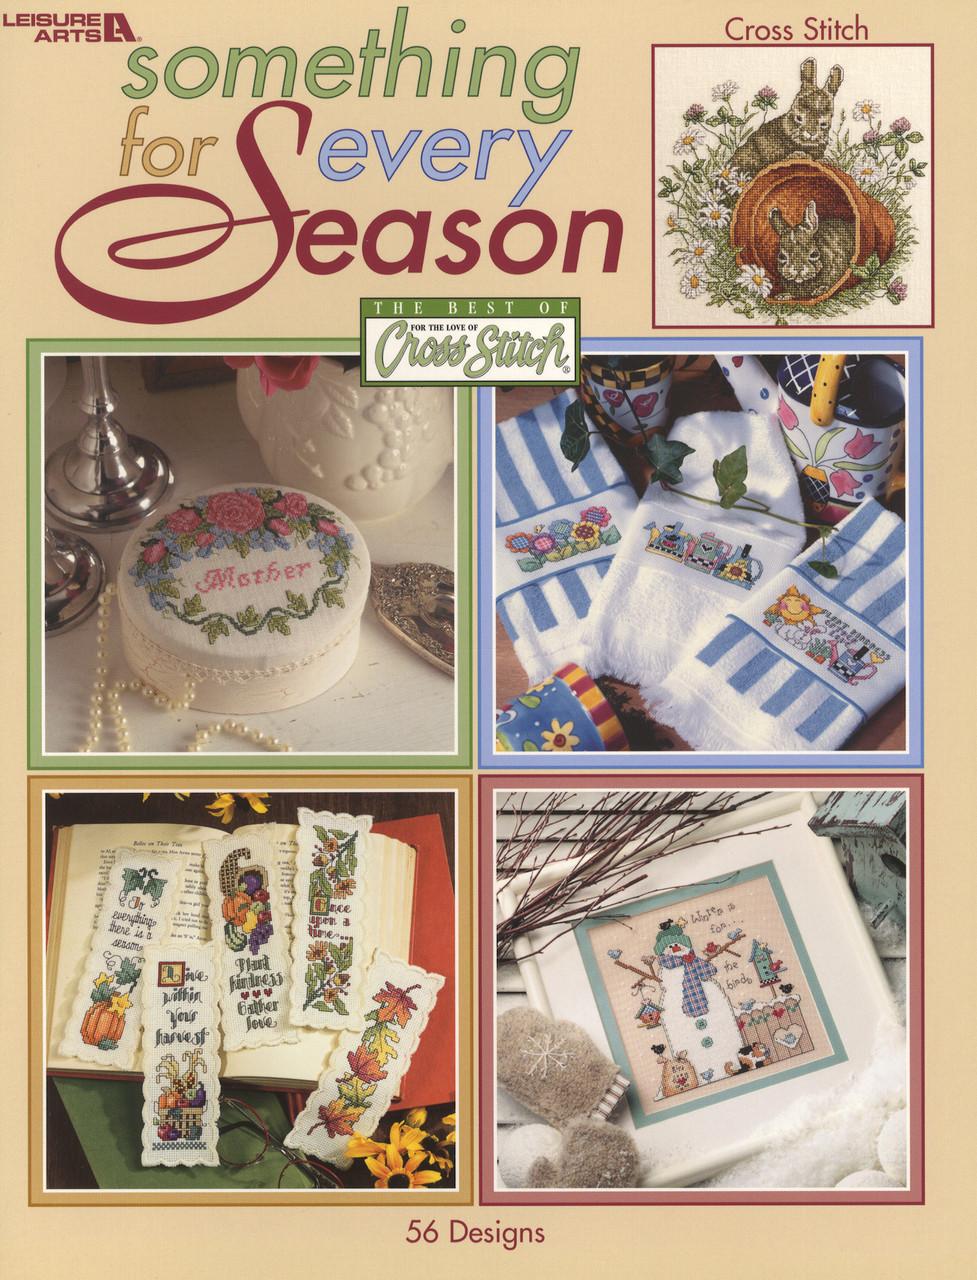 Leisure Arts - Something for Every Season